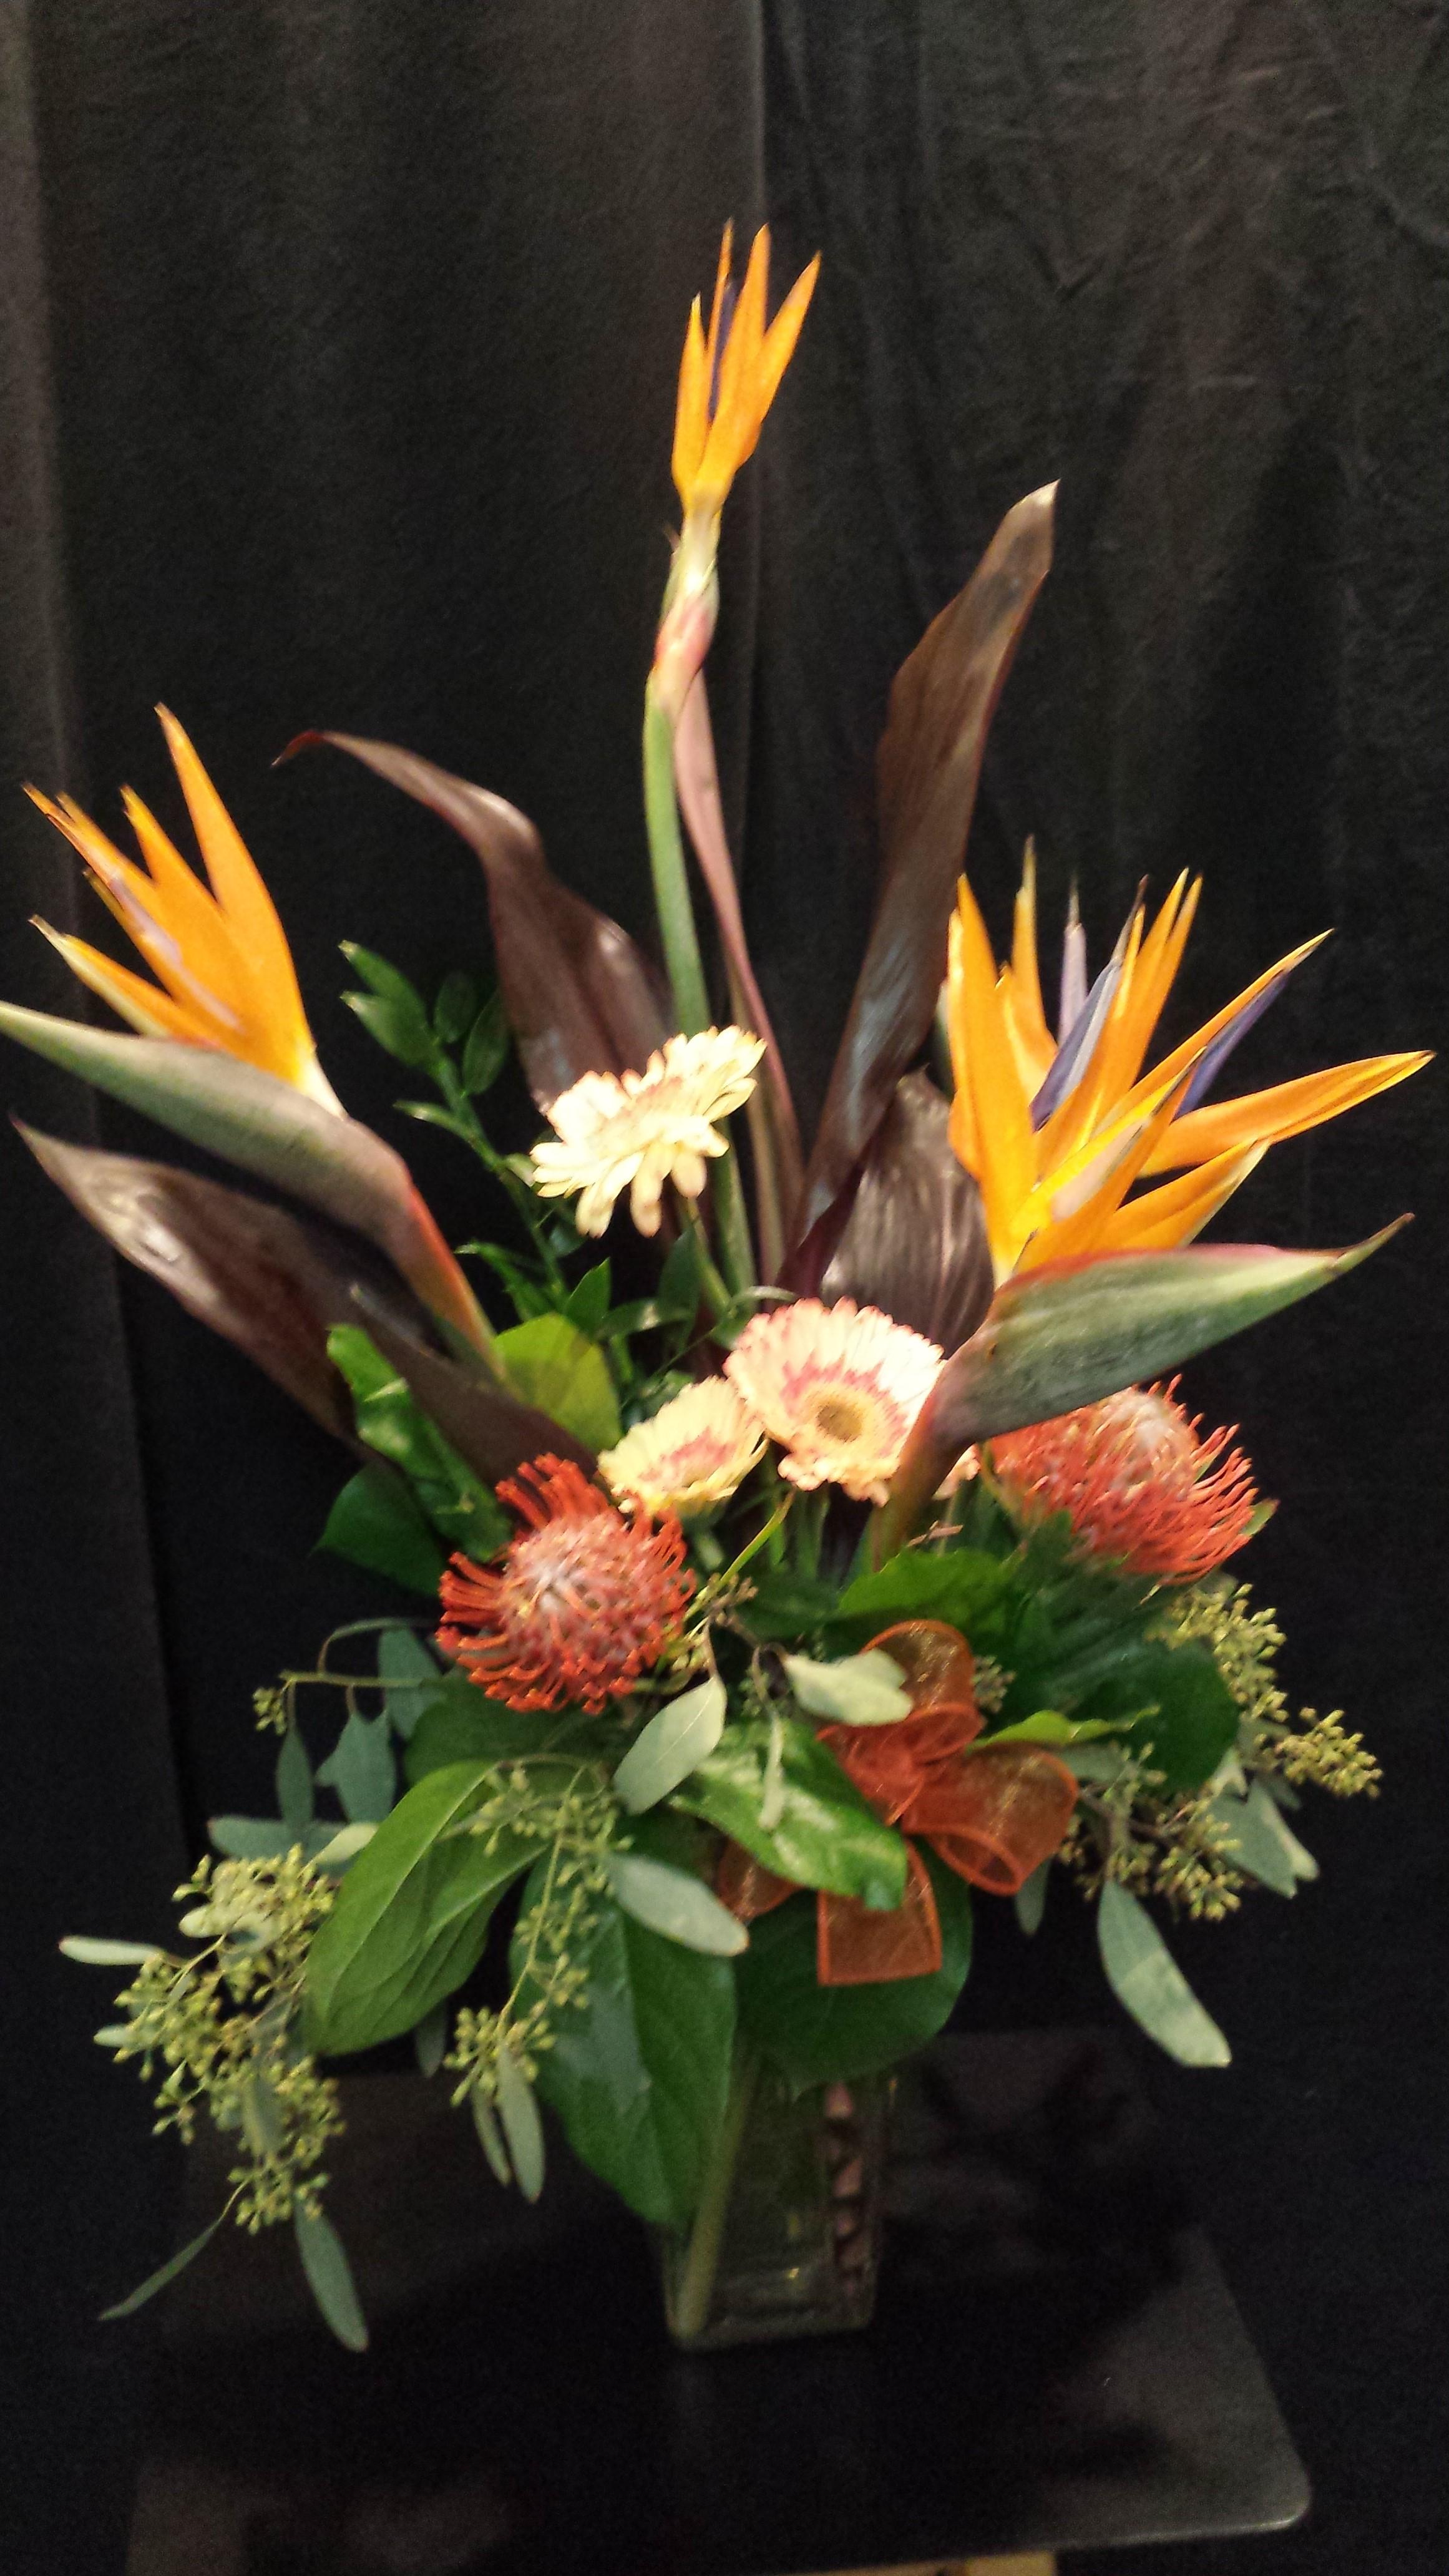 Florist atlanta ga flower shop near me vann jernigan florist call our flower shop at 404 881 9790 for beautiful floral arrangements izmirmasajfo Choice Image